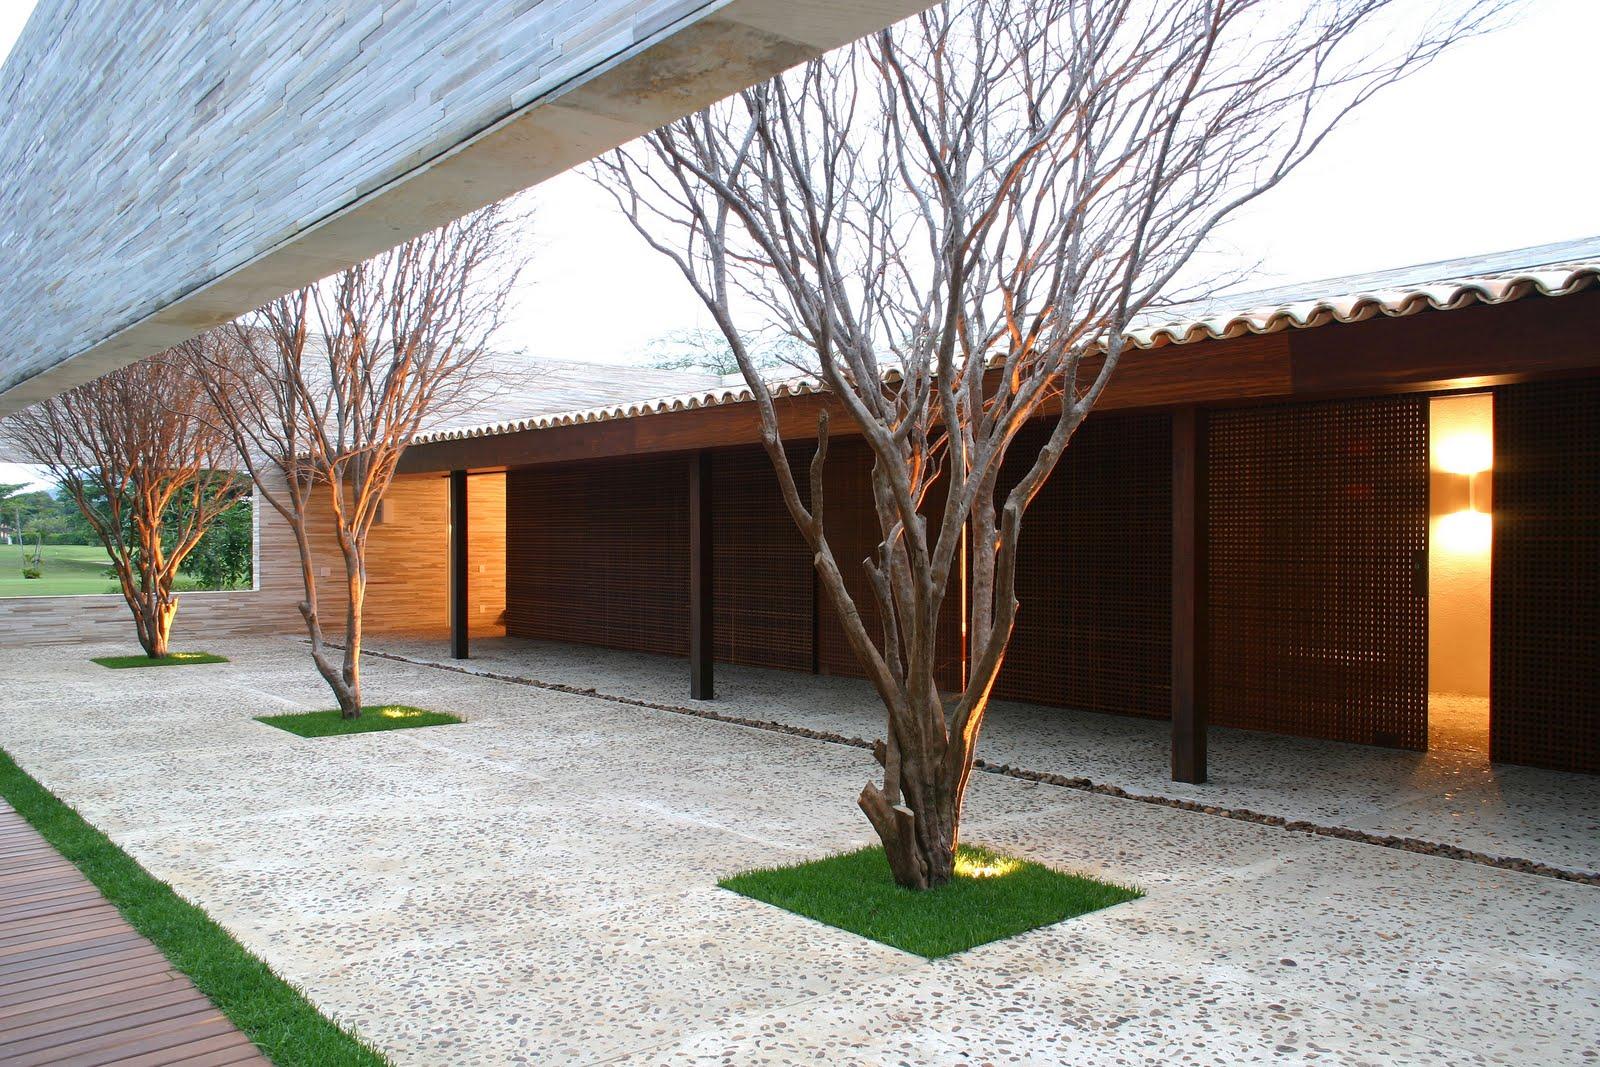 Casa du plessis de mk27 revista arquitectura y dise o - Arquitectura de diseno ...